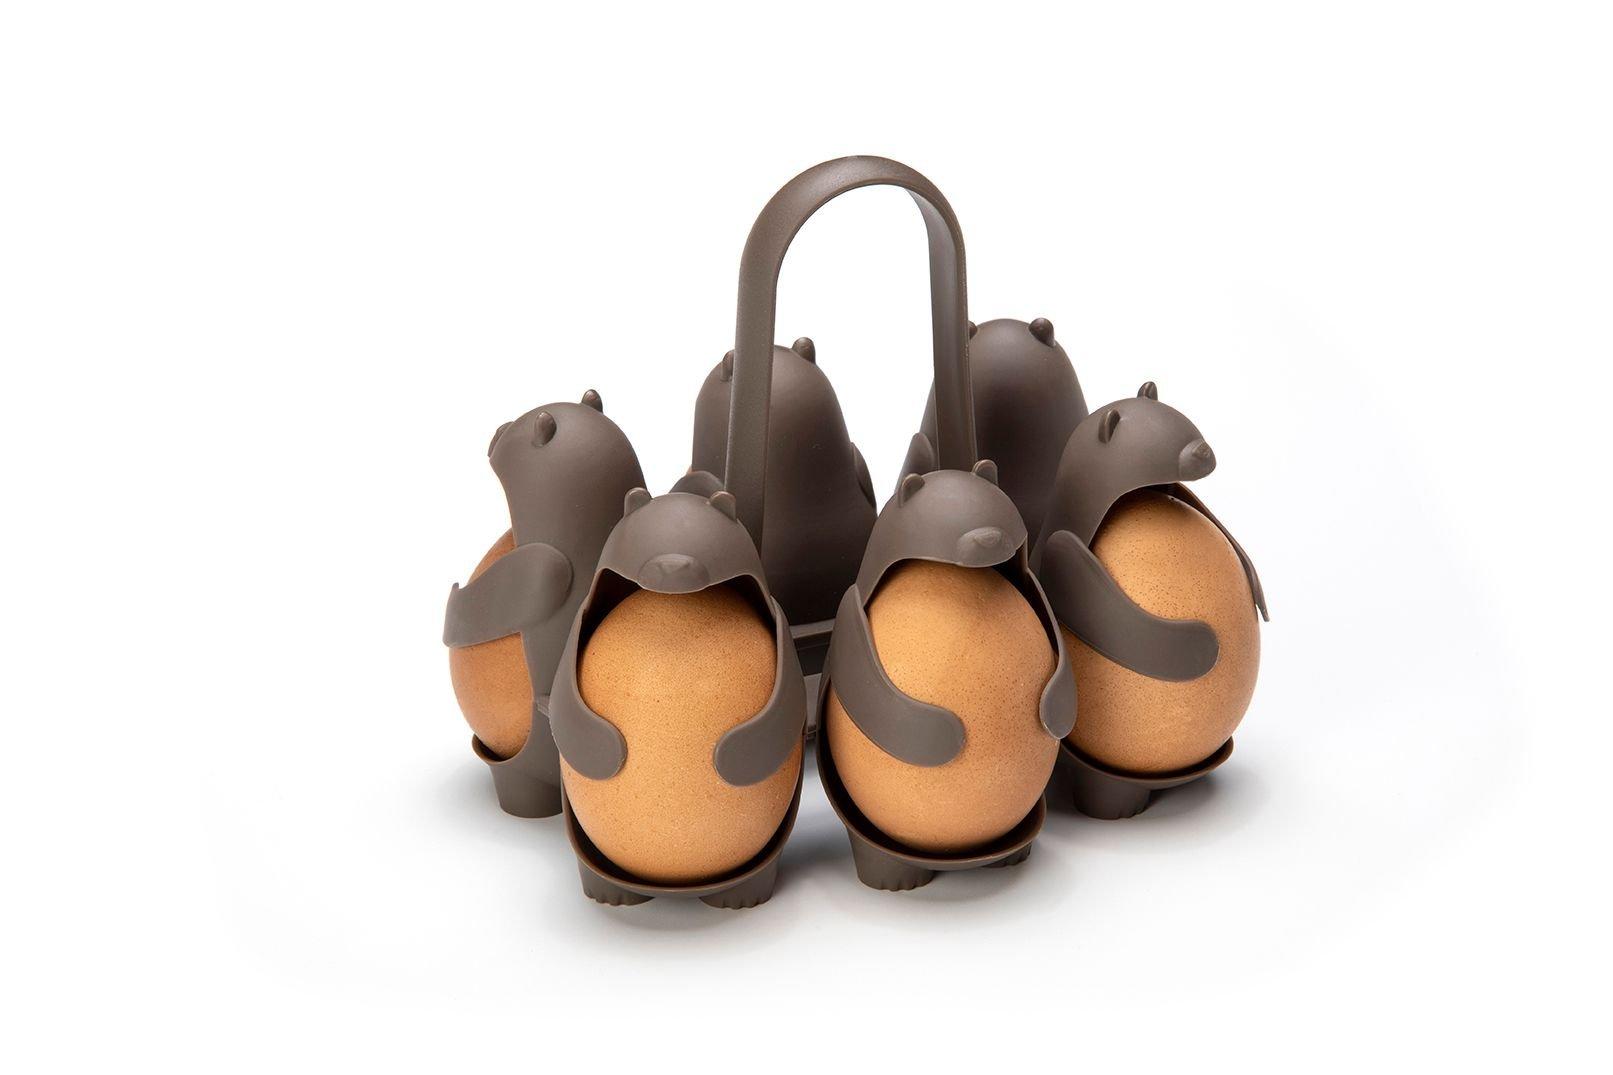 Peleg Design - Eggbears Egg Boilers (PE482)